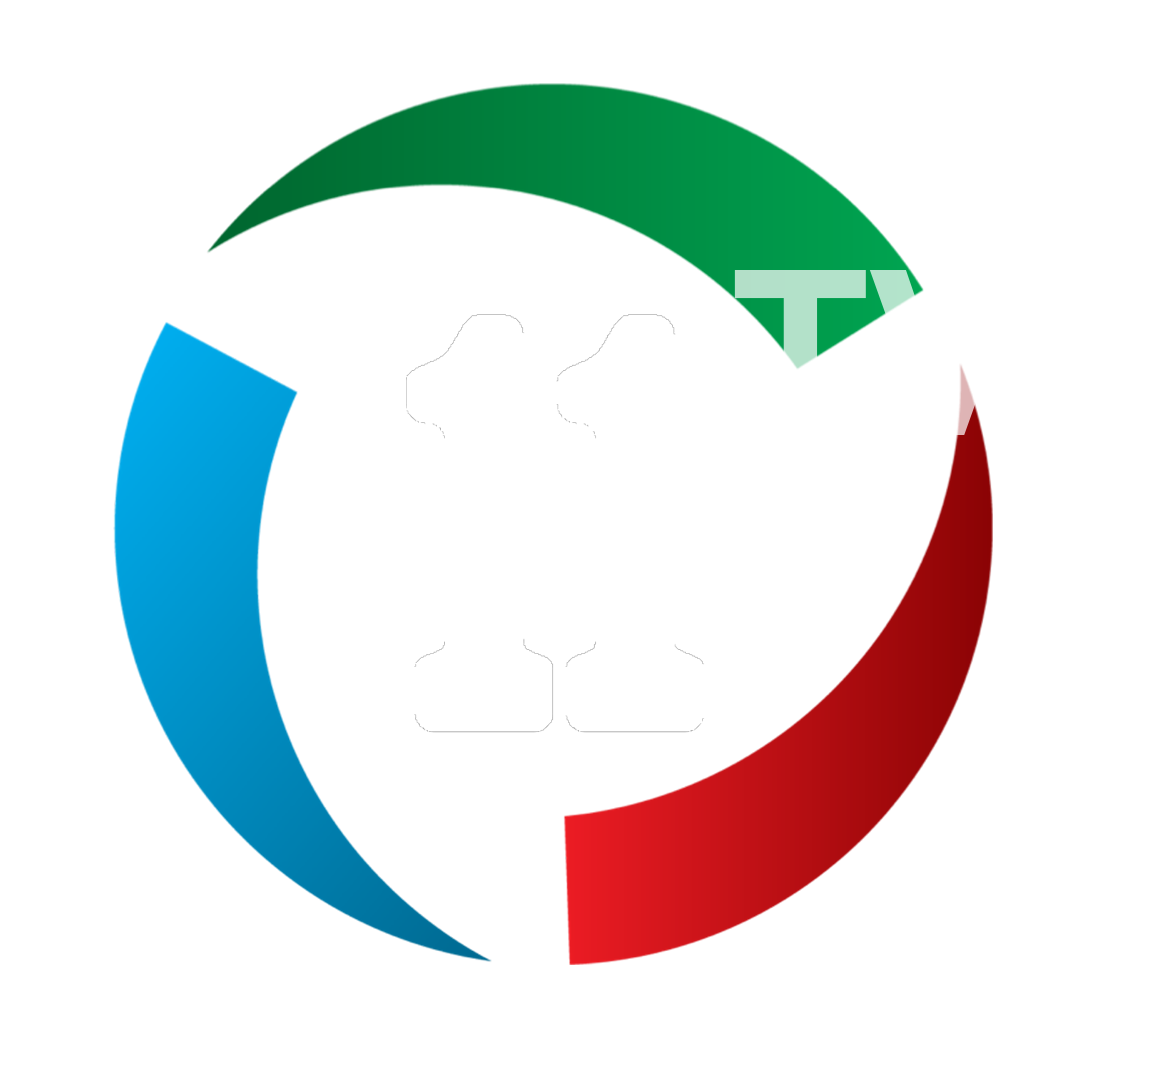 logo blanco 11tv con tv (1) png